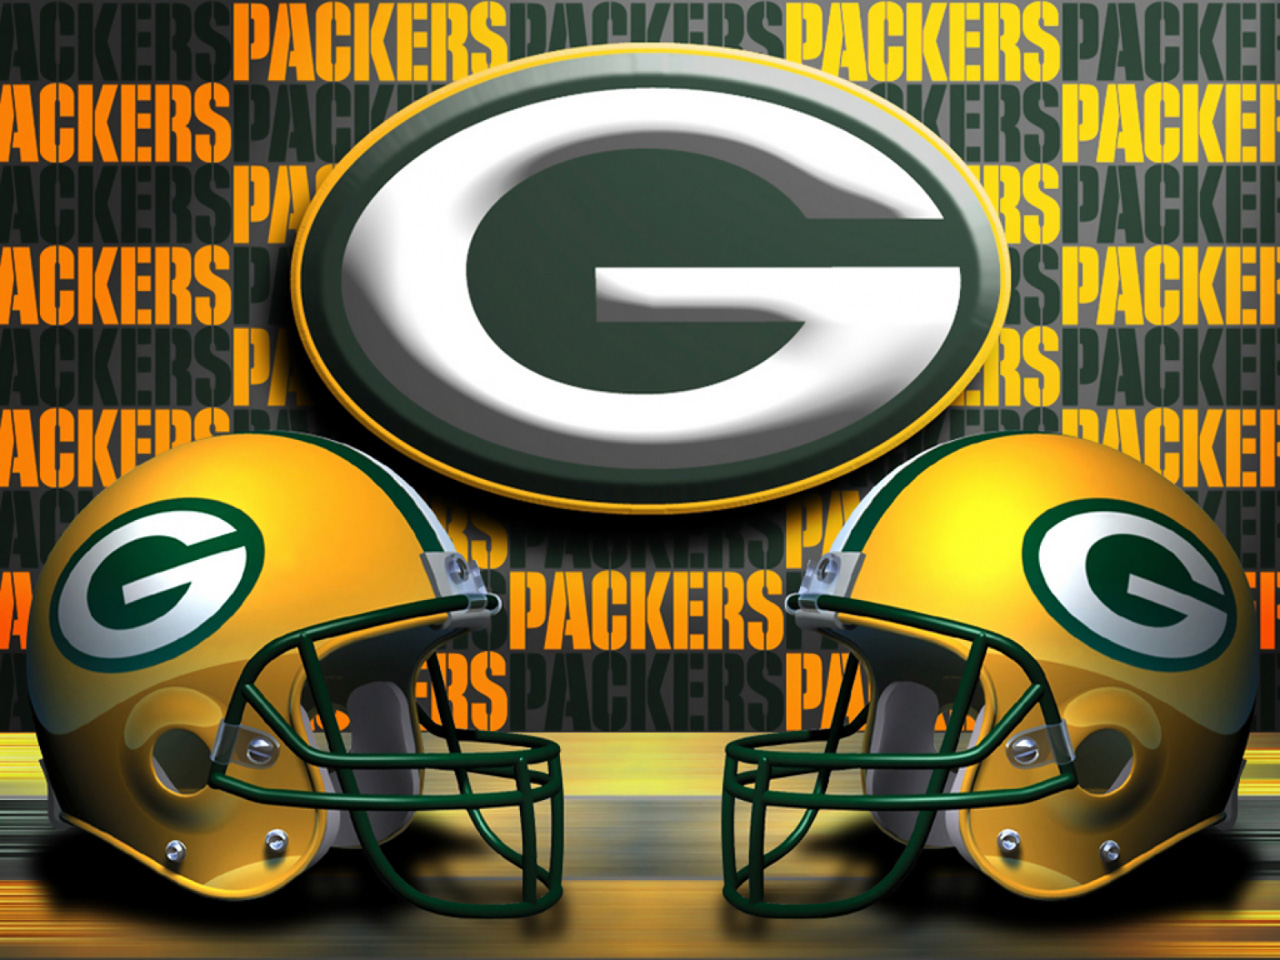 Green Bay Packers Wallpaper Tampa Bay Packers Club